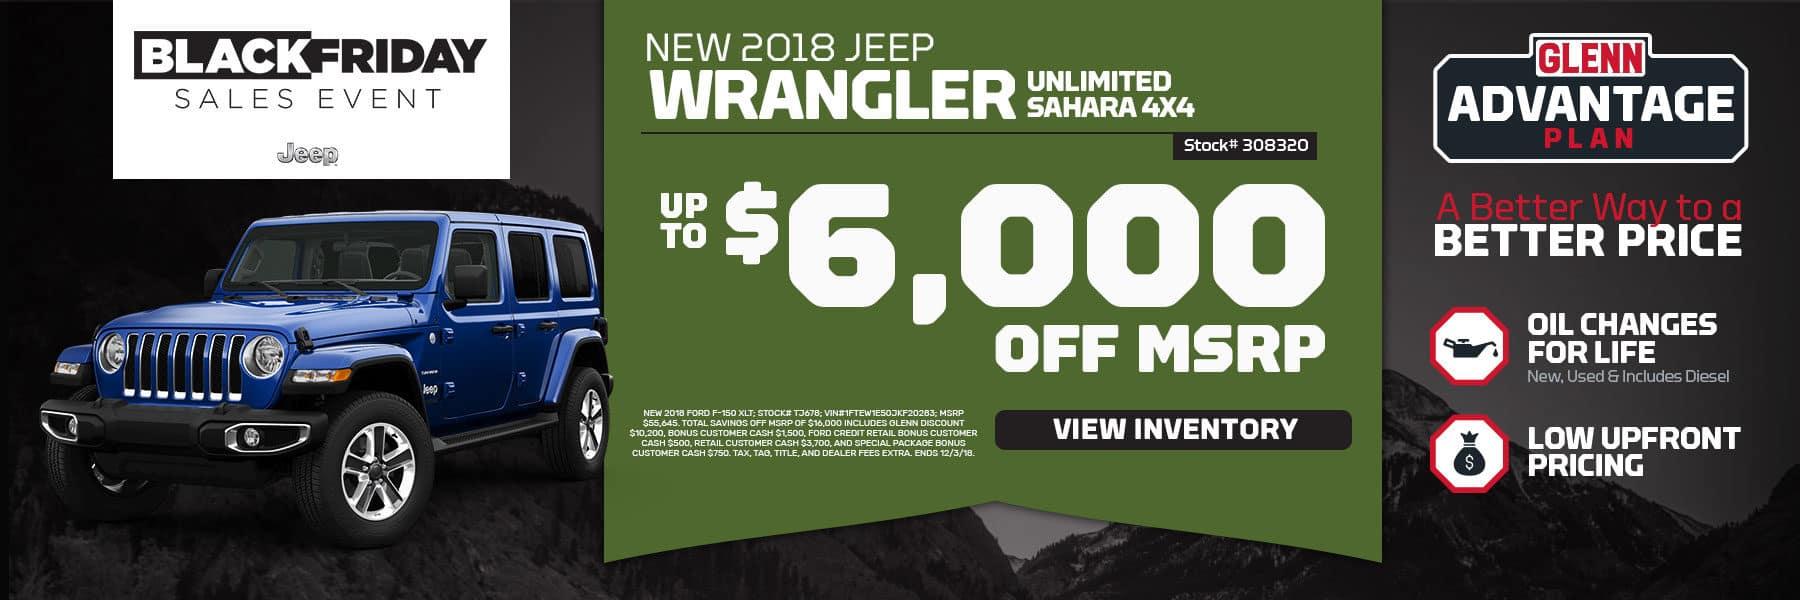 Black Friday Sale Jeep Wrangler